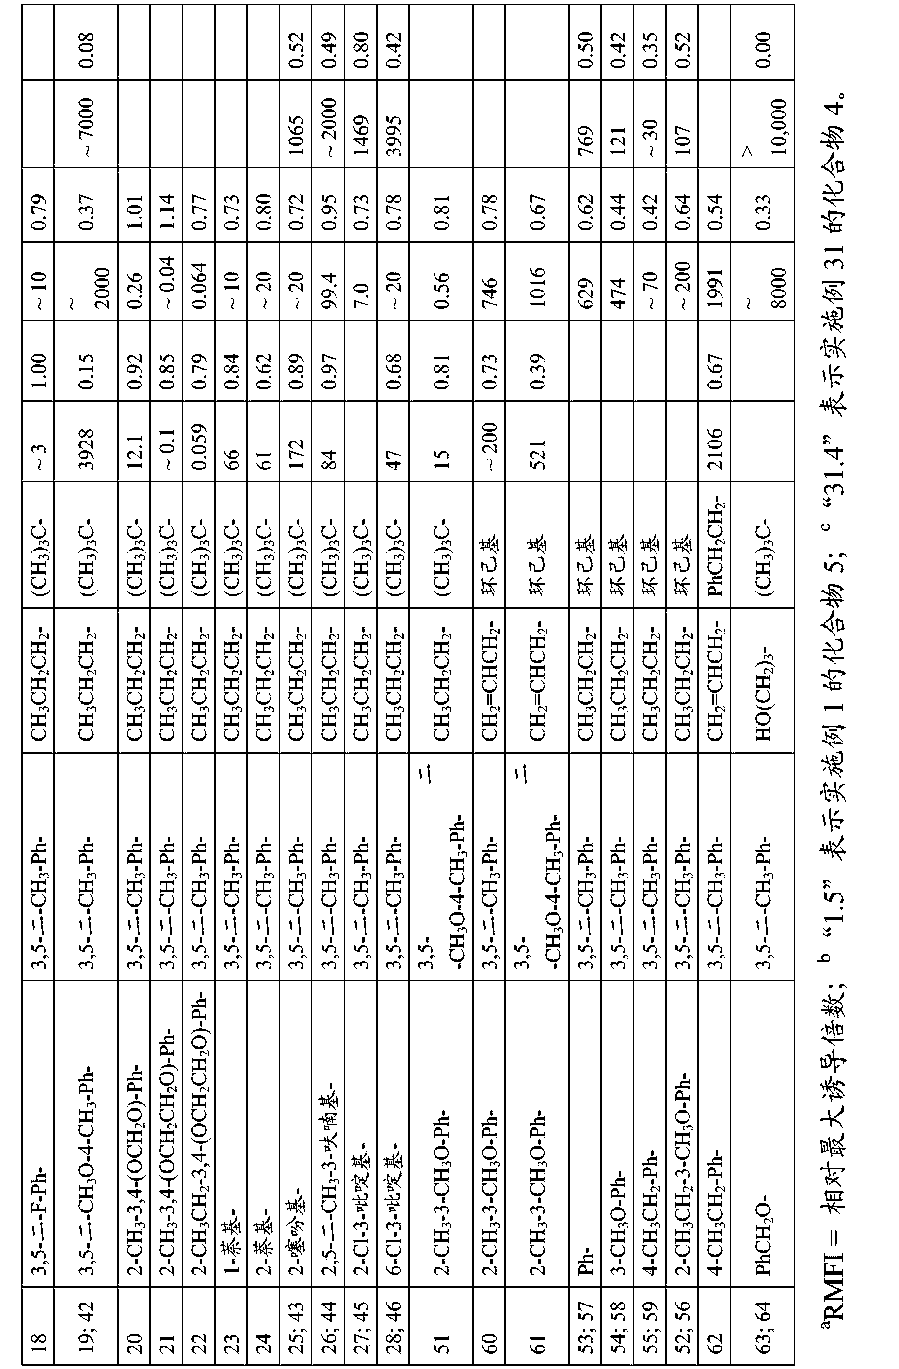 CN104761466A - Chiral diacylhydrazine ligands for modulating